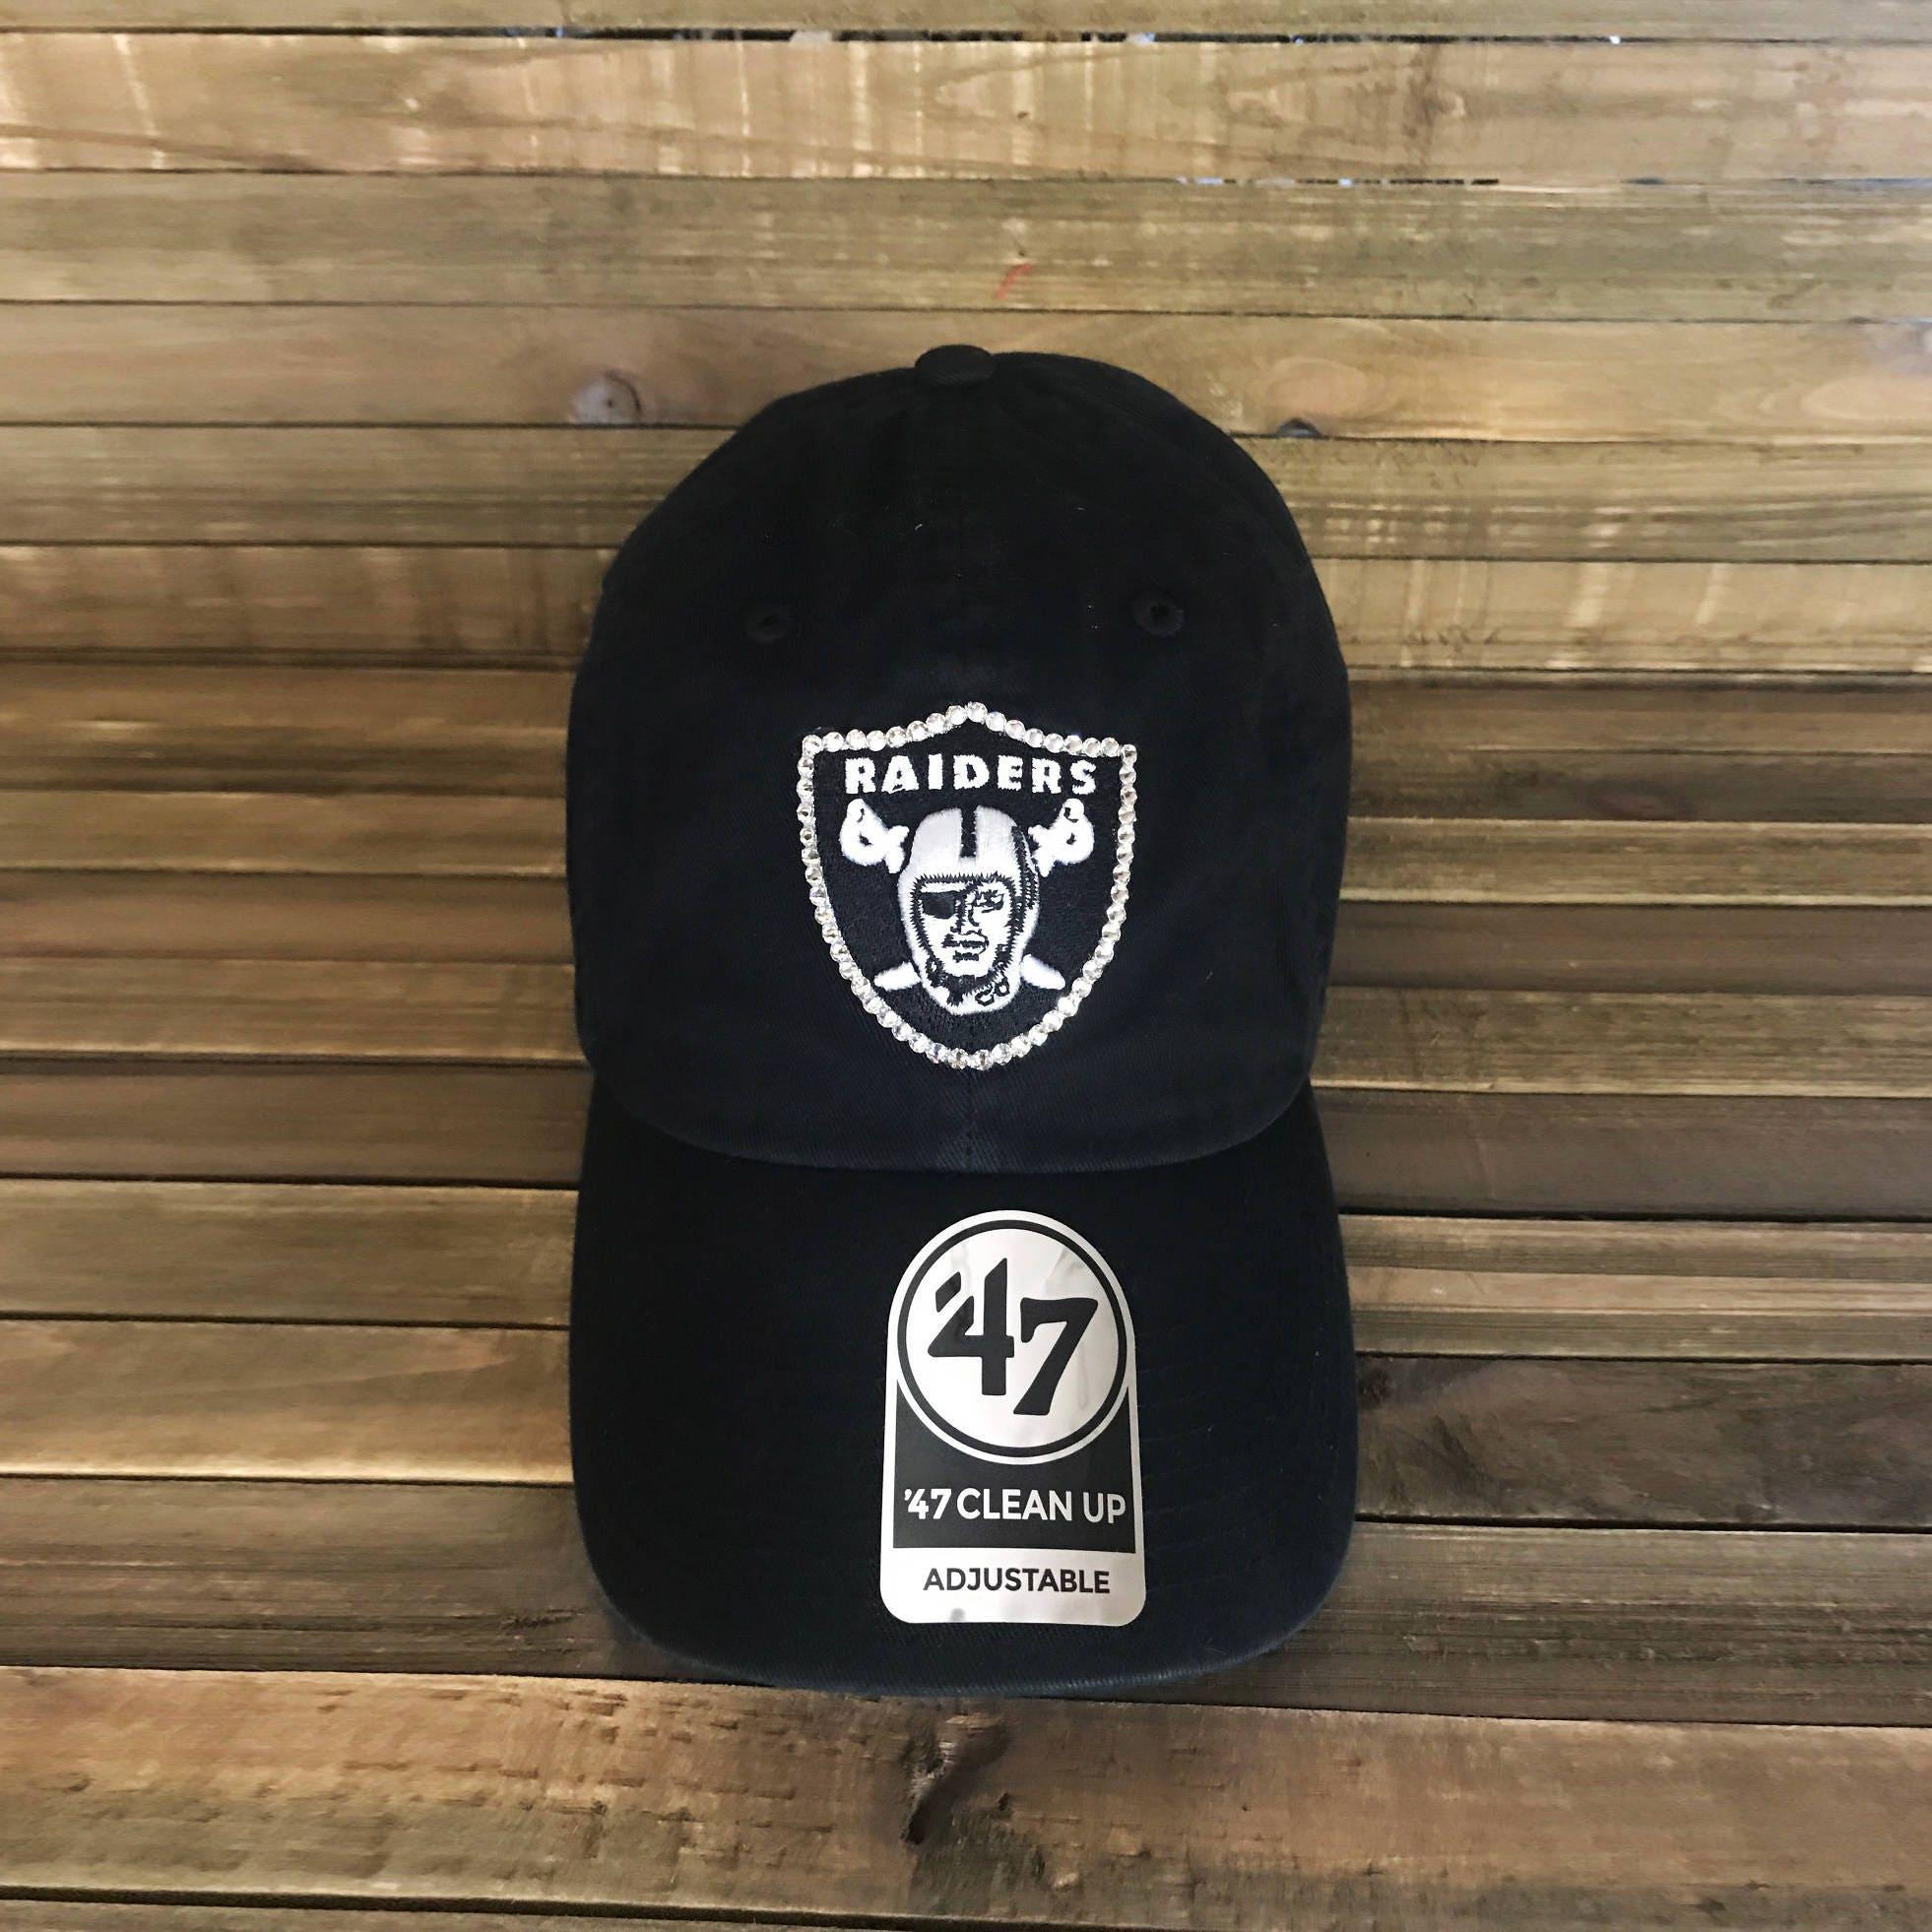 969a5d4ad47 New Era NFL Raiders Hat